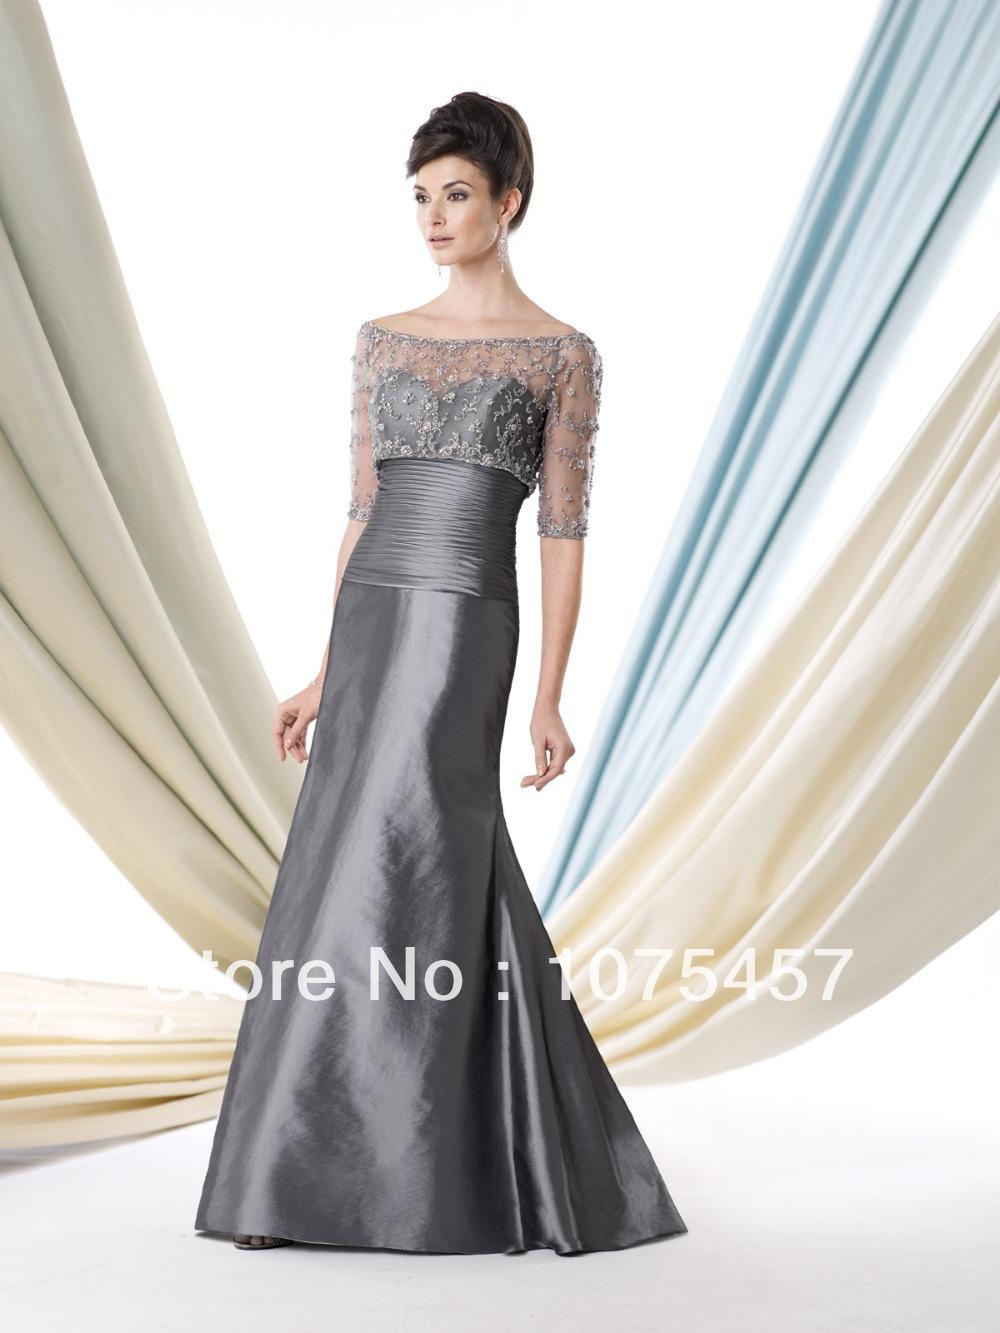 Popular Designer Dress Mother Bride-Buy Cheap Designer Dress ...